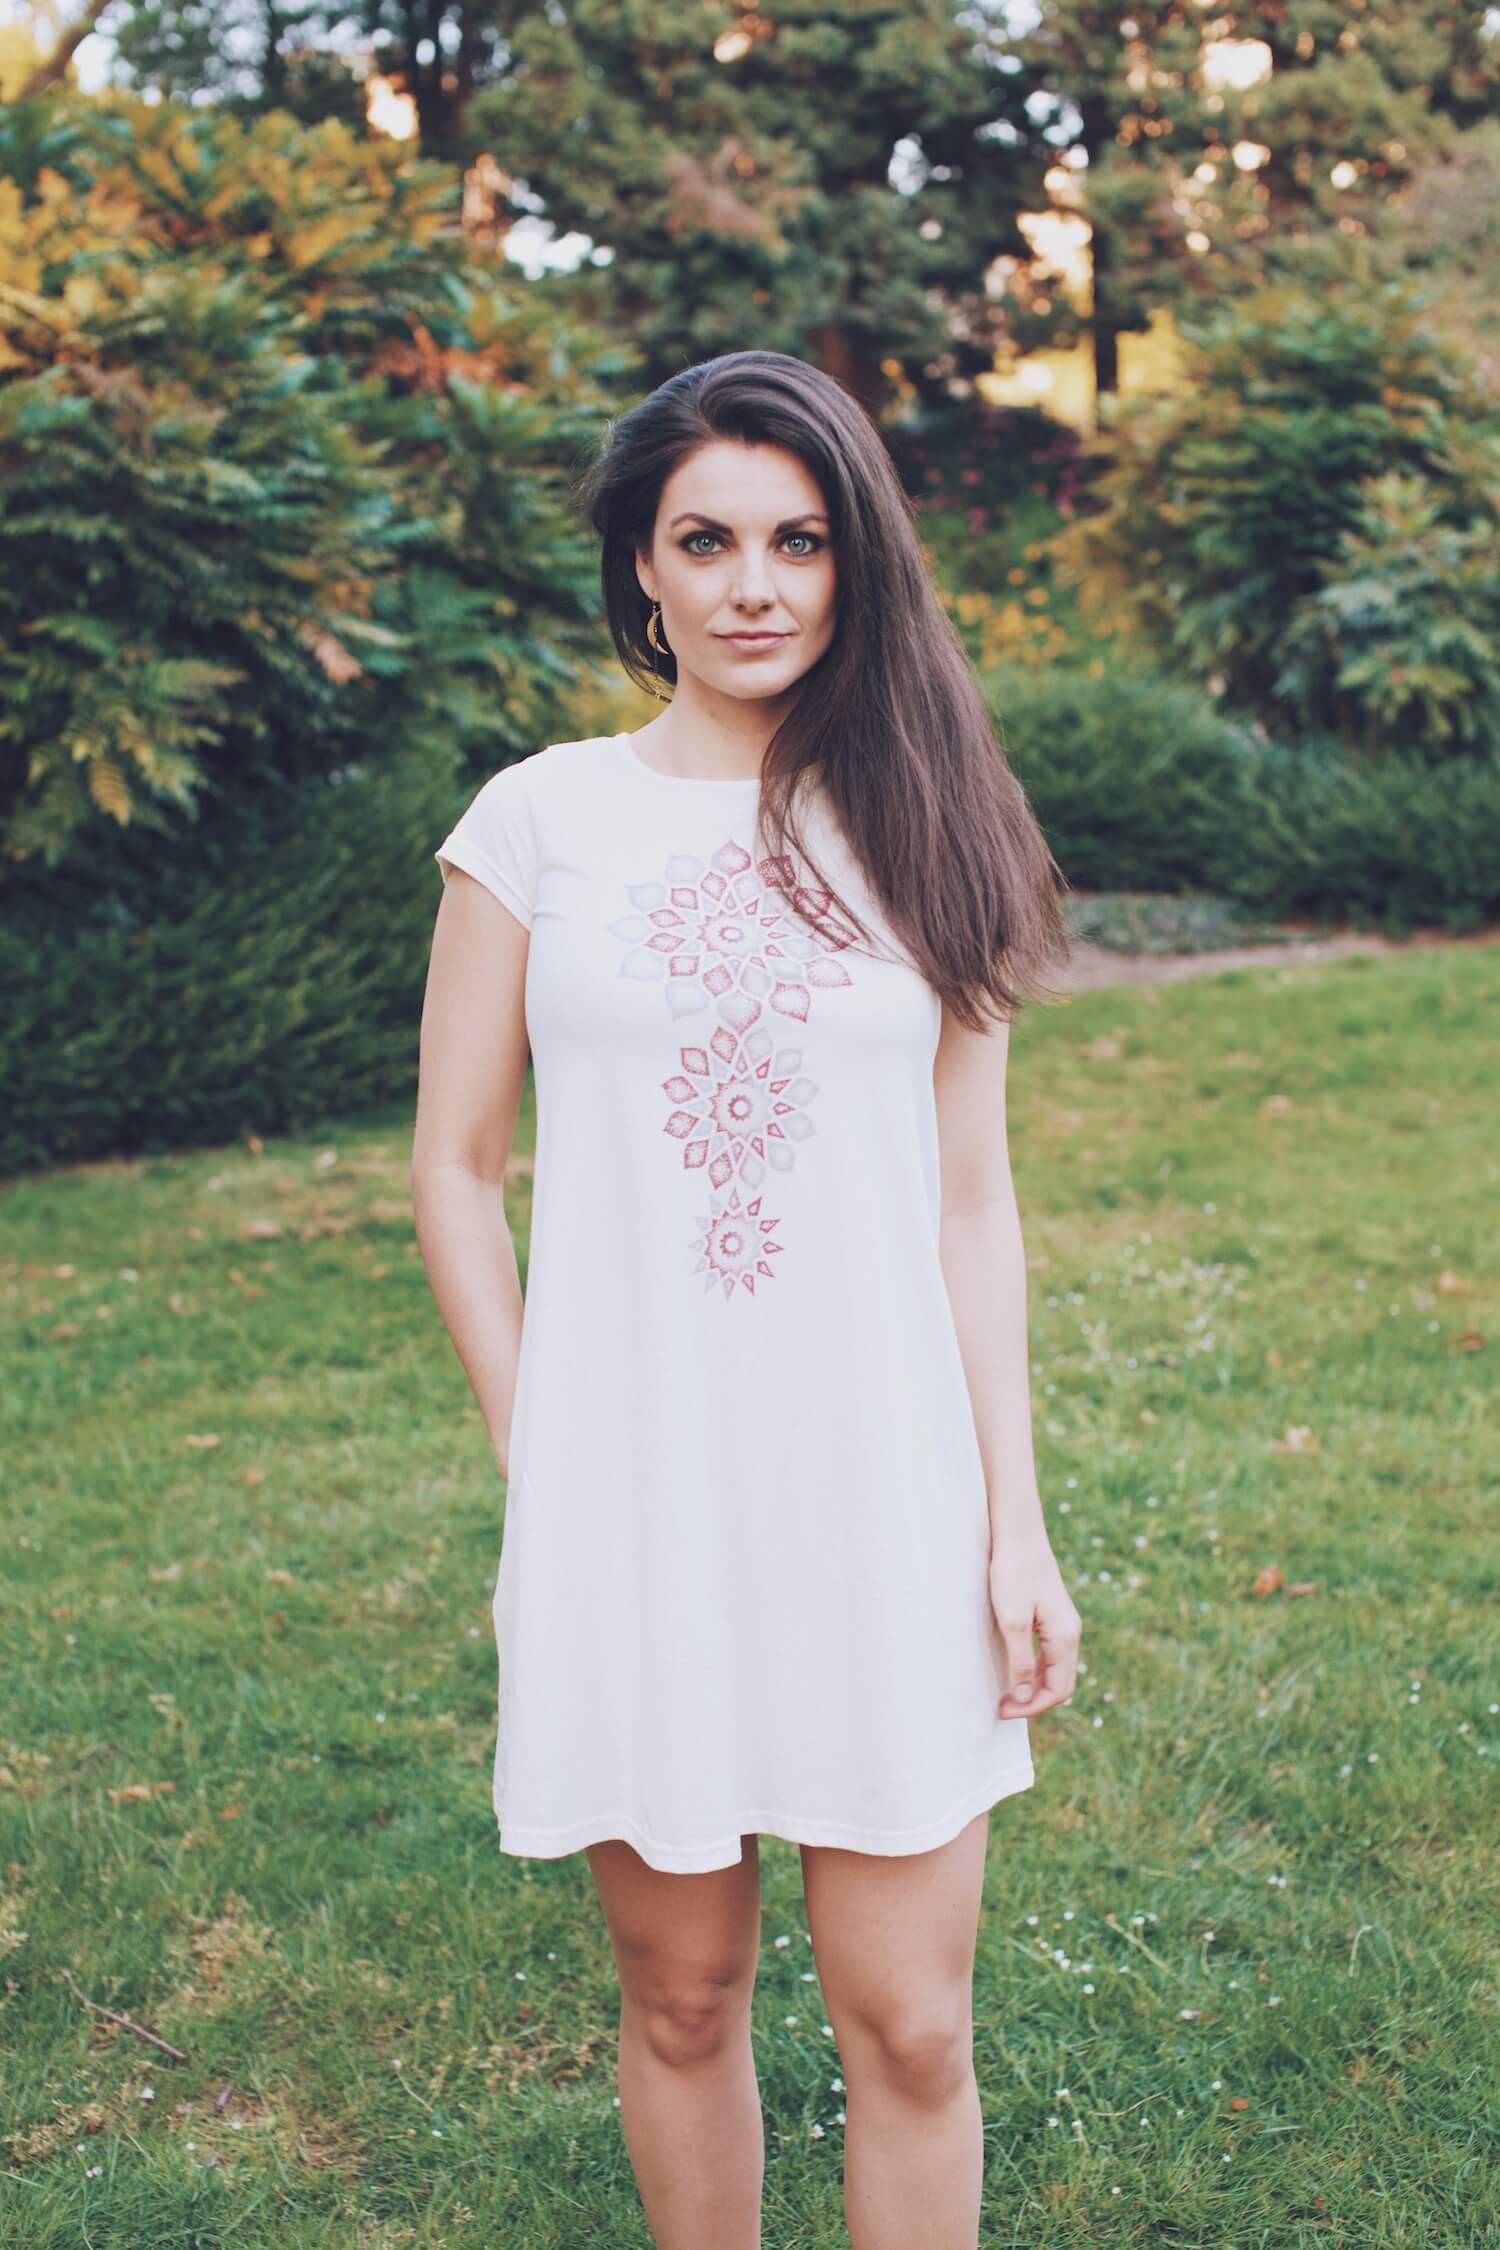 rachaels journal soul flower boho hippie style blog post - Best T Shirt Dress for Summer